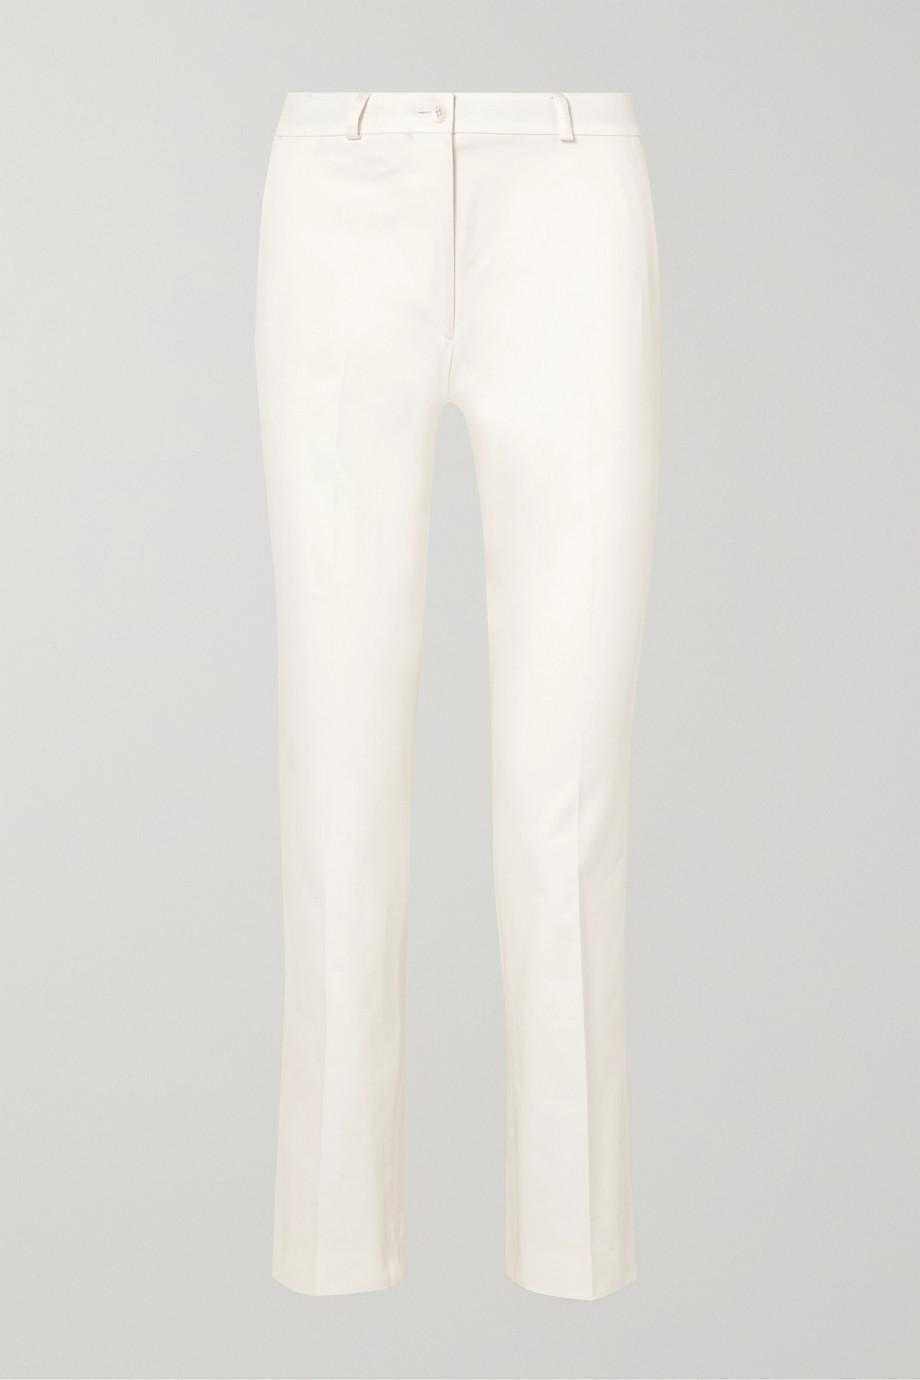 Etro Pantalon slim raccourci en coton mélangé